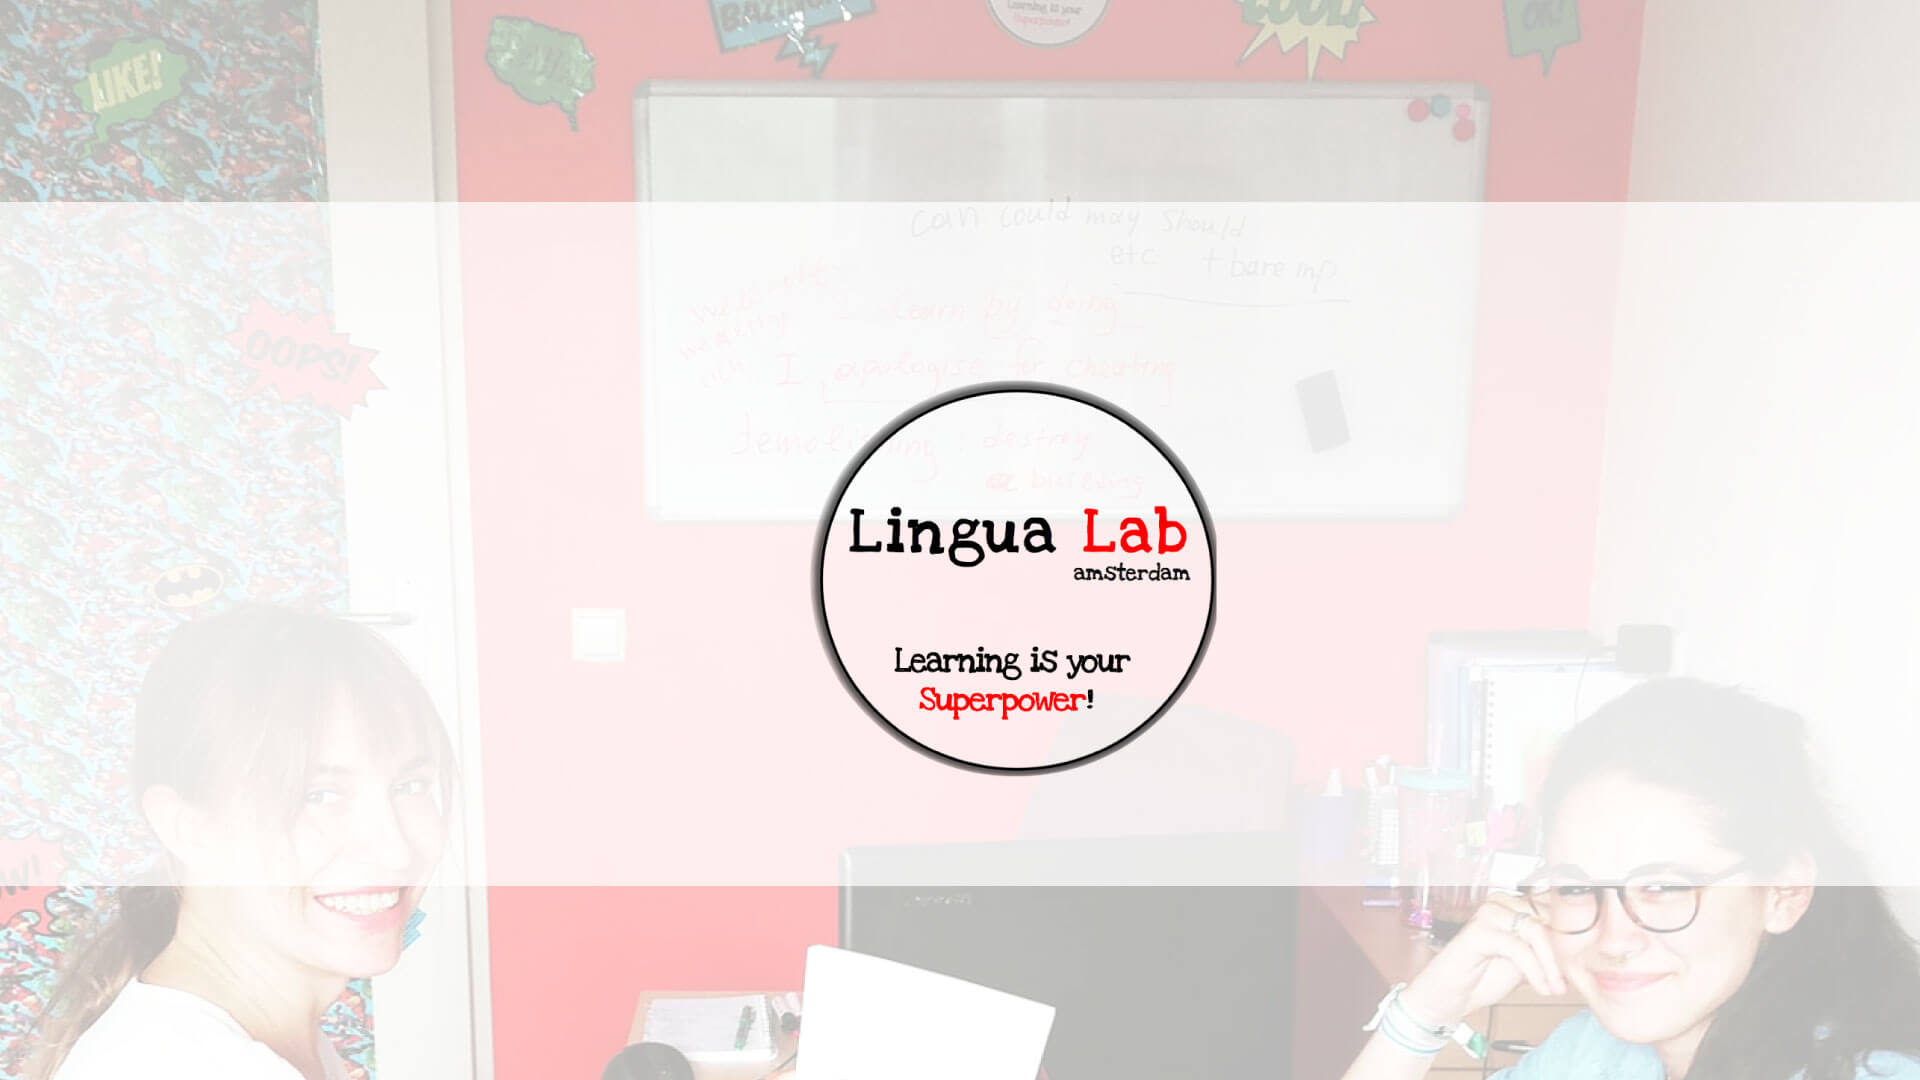 Lingua Lab Amsterdam